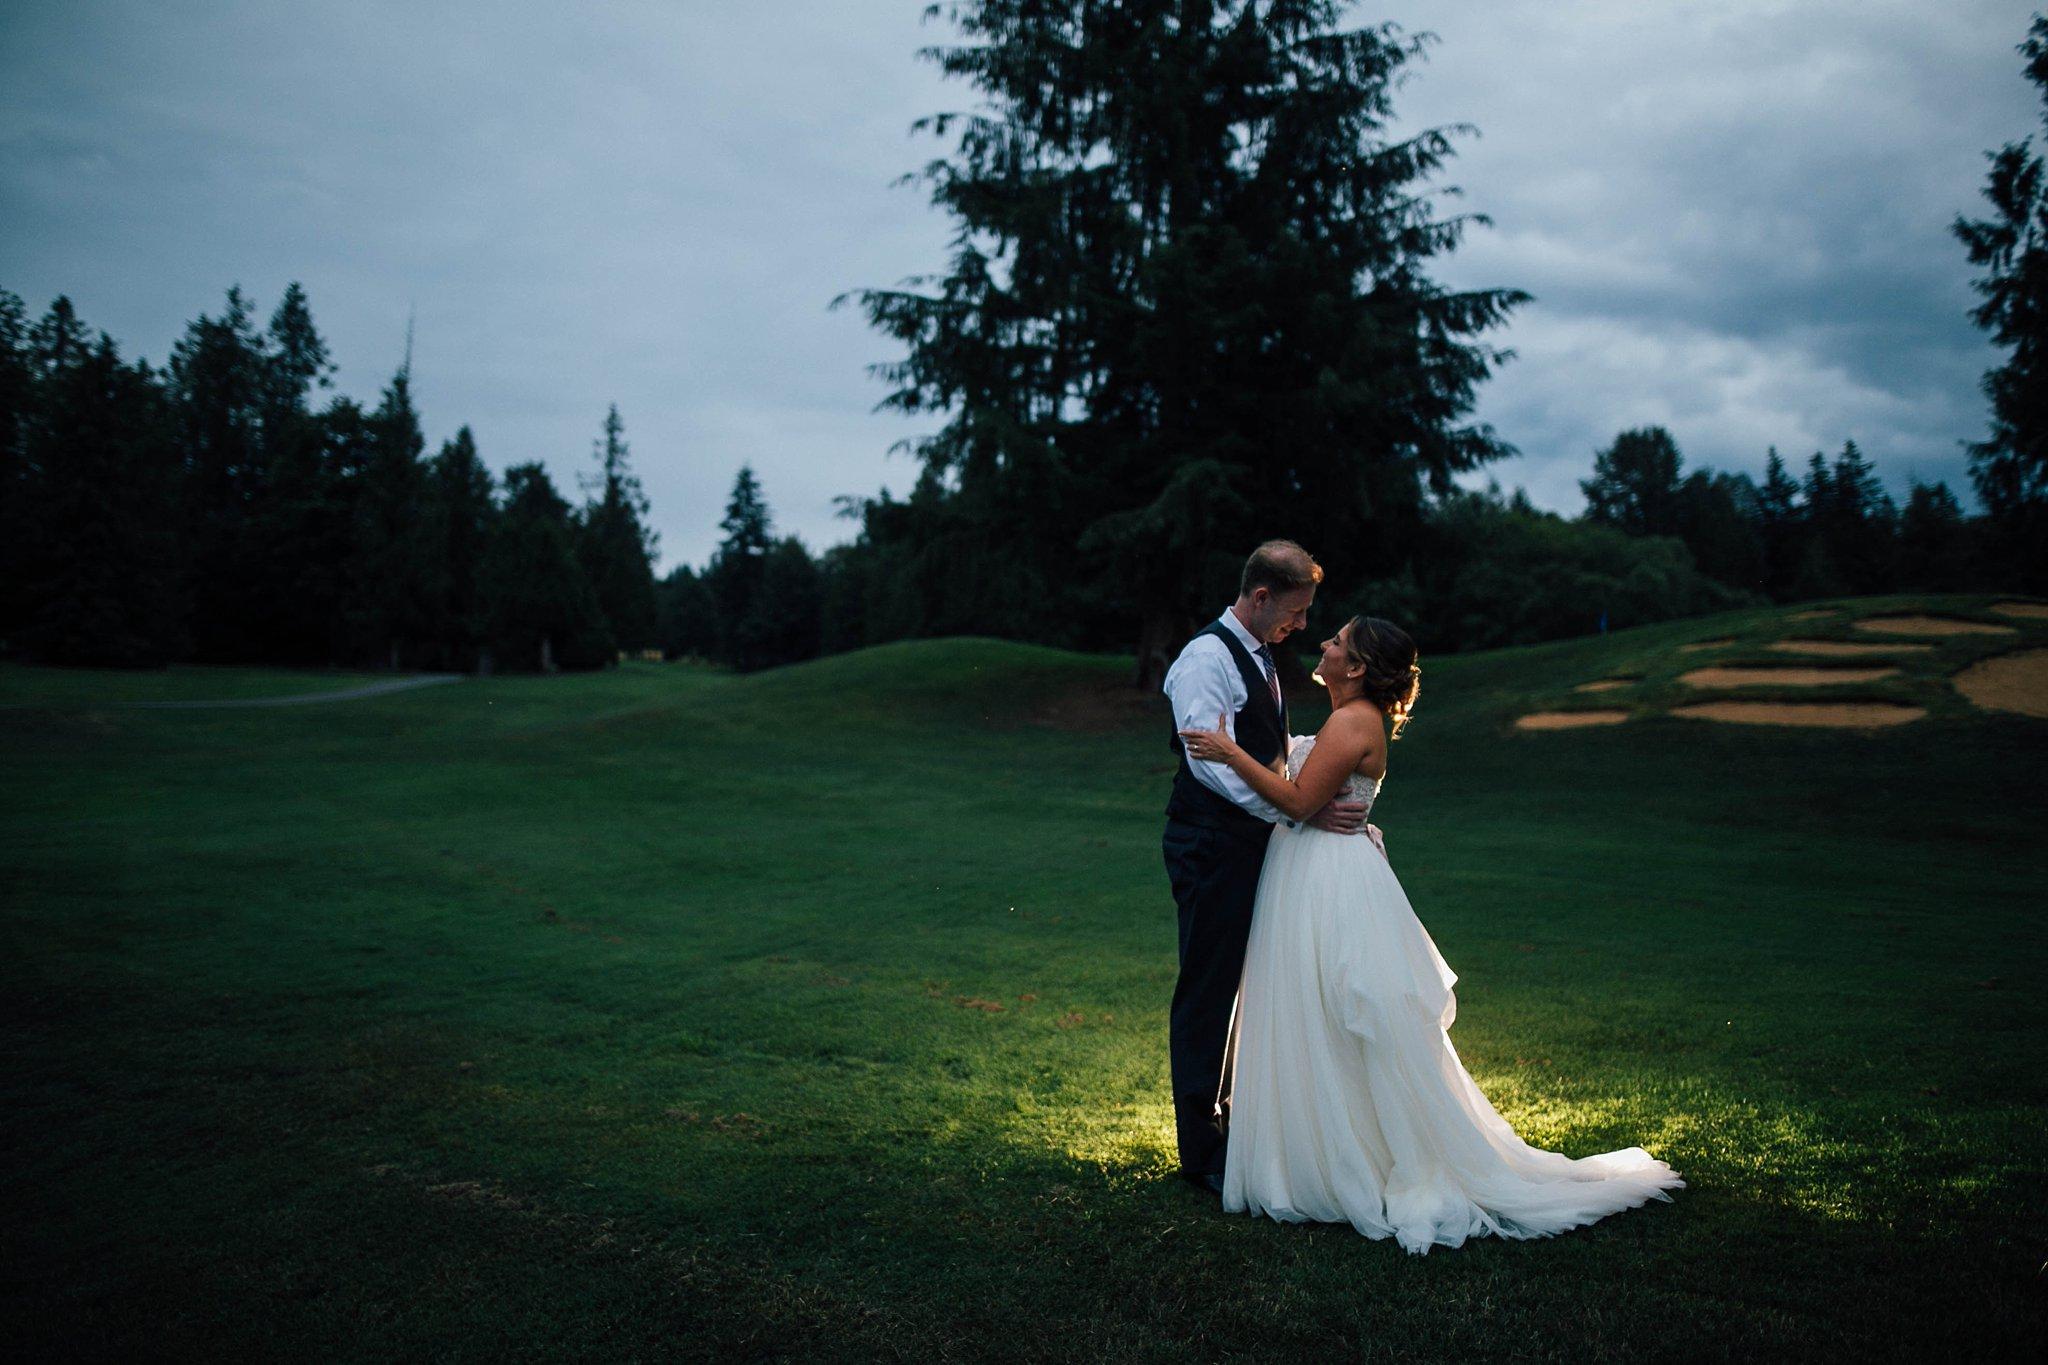 ashley_vos_seattle_wedding_photographer_0201.jpg